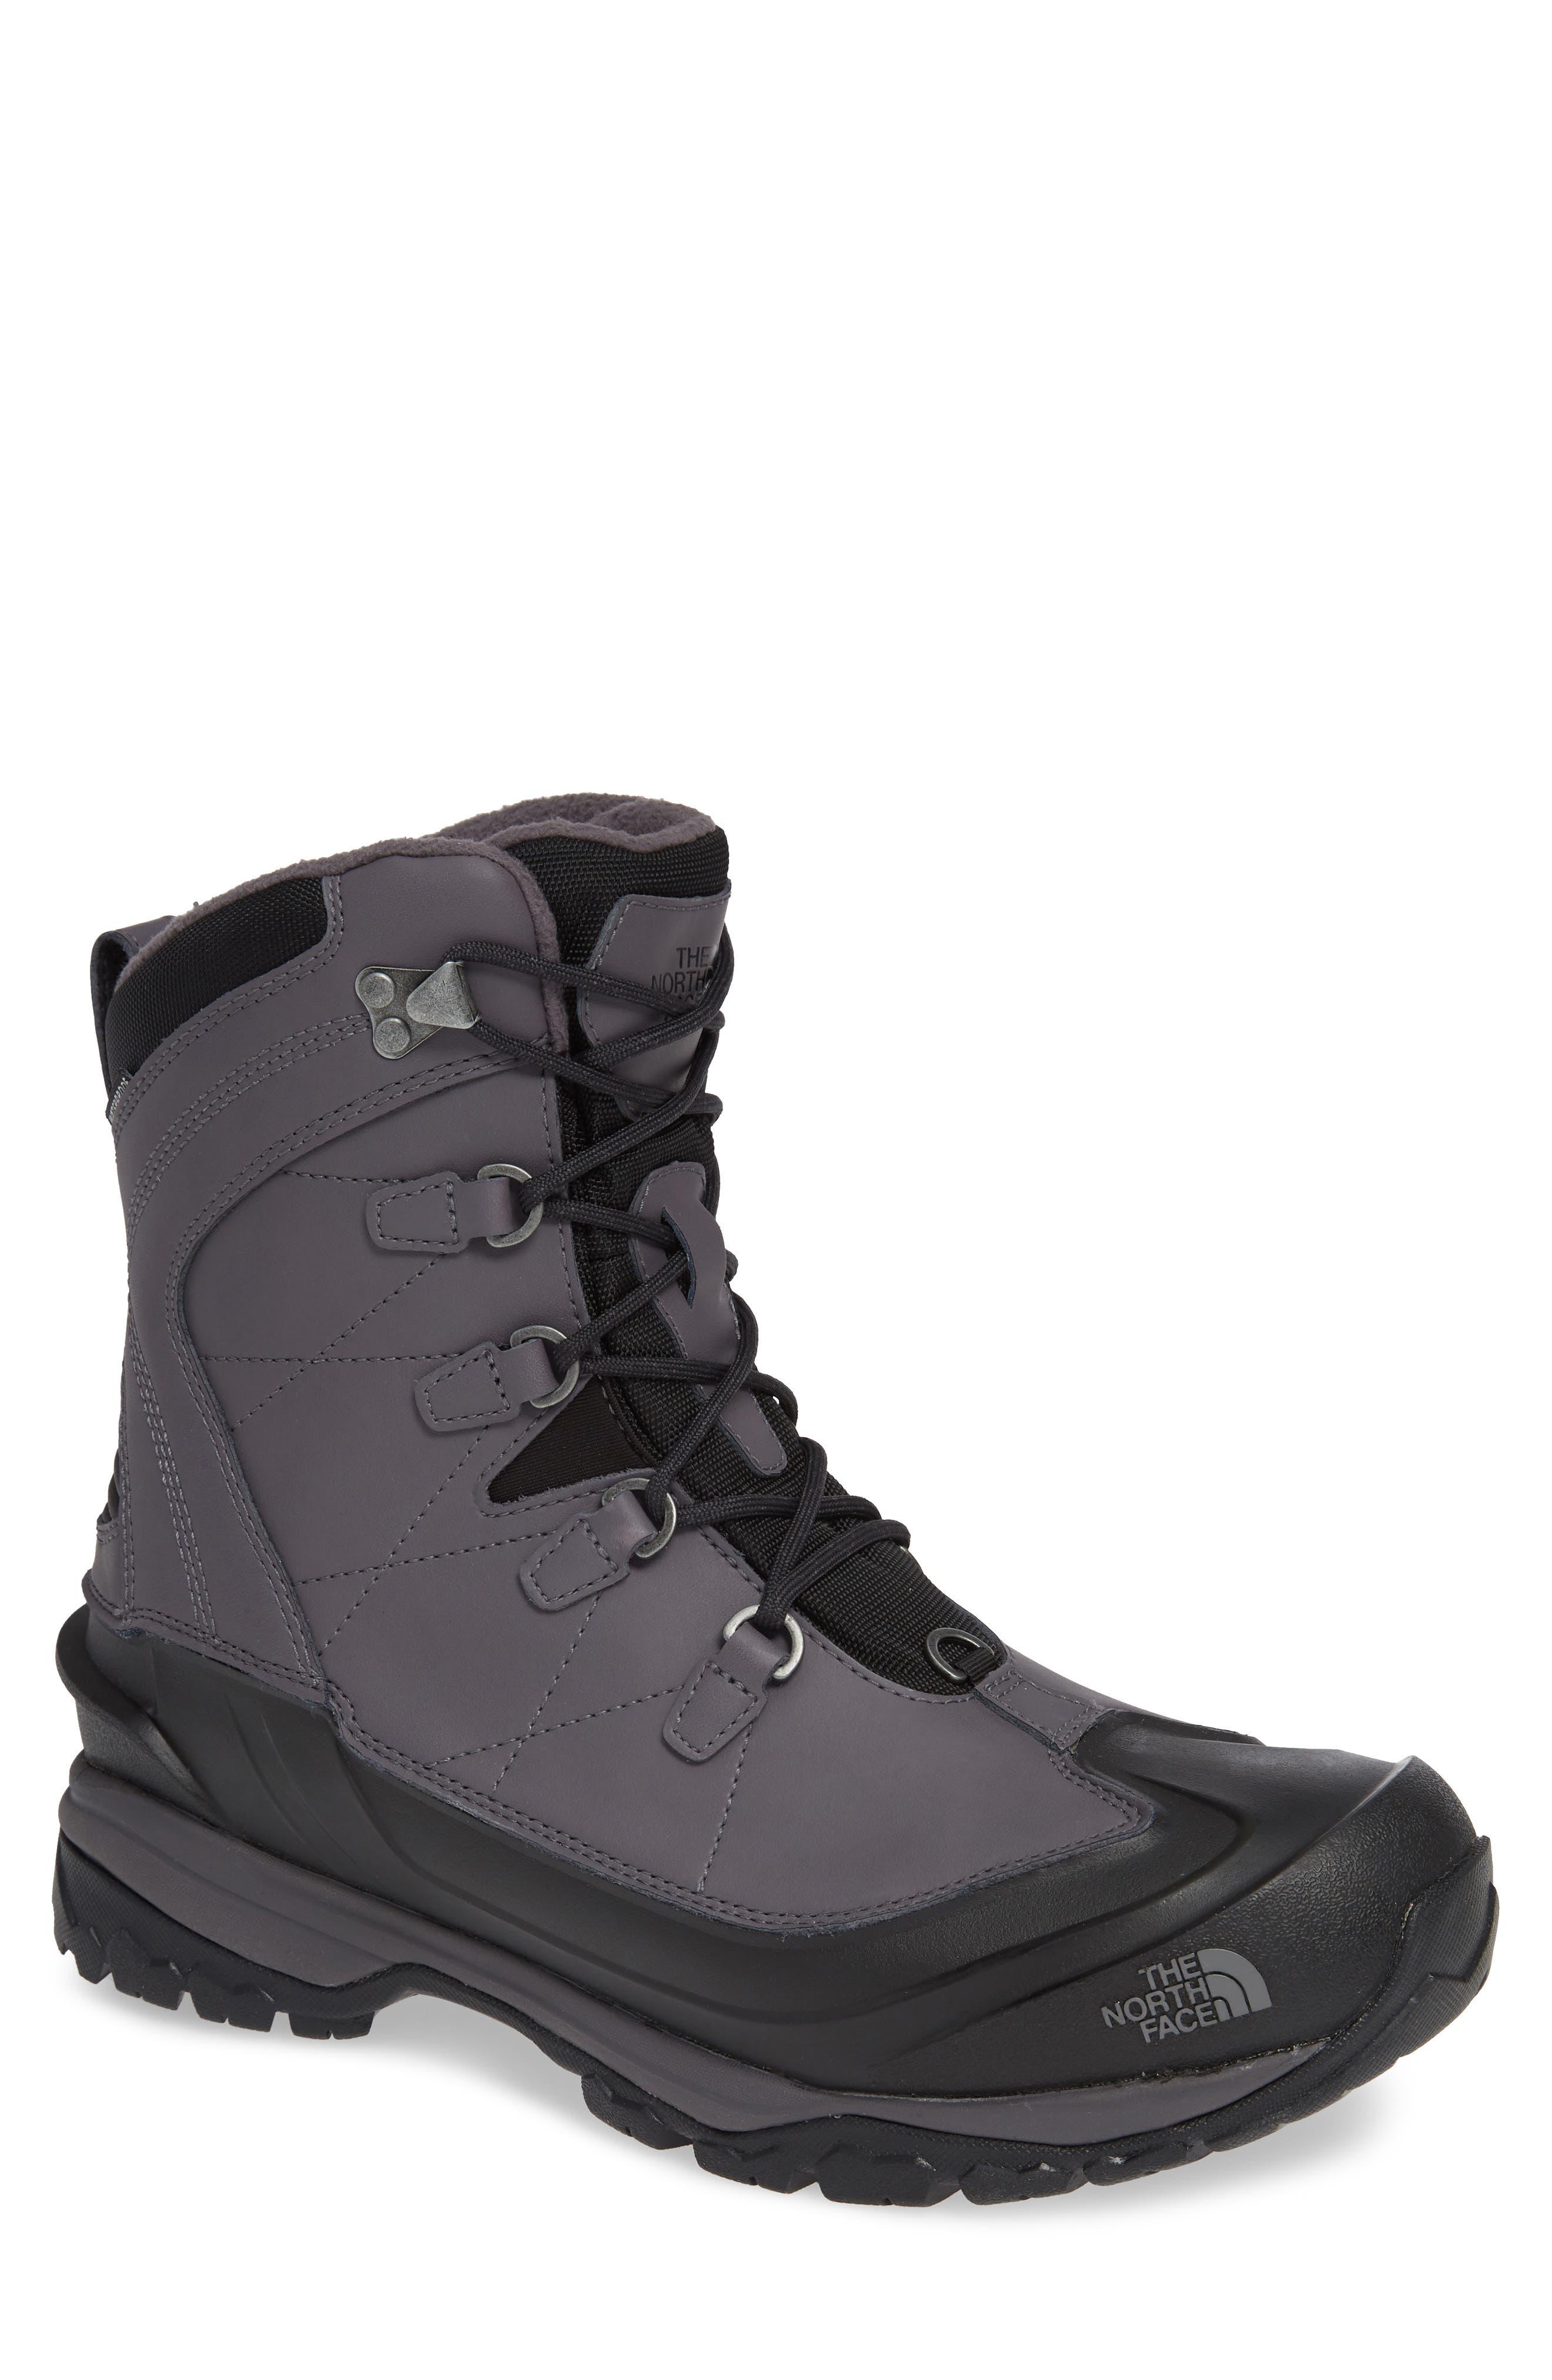 Chilkat Evo Waterproof Insulated Snow Boot,                             Main thumbnail 1, color,                             BLACKENED PEARL/ PHANTOM GREY